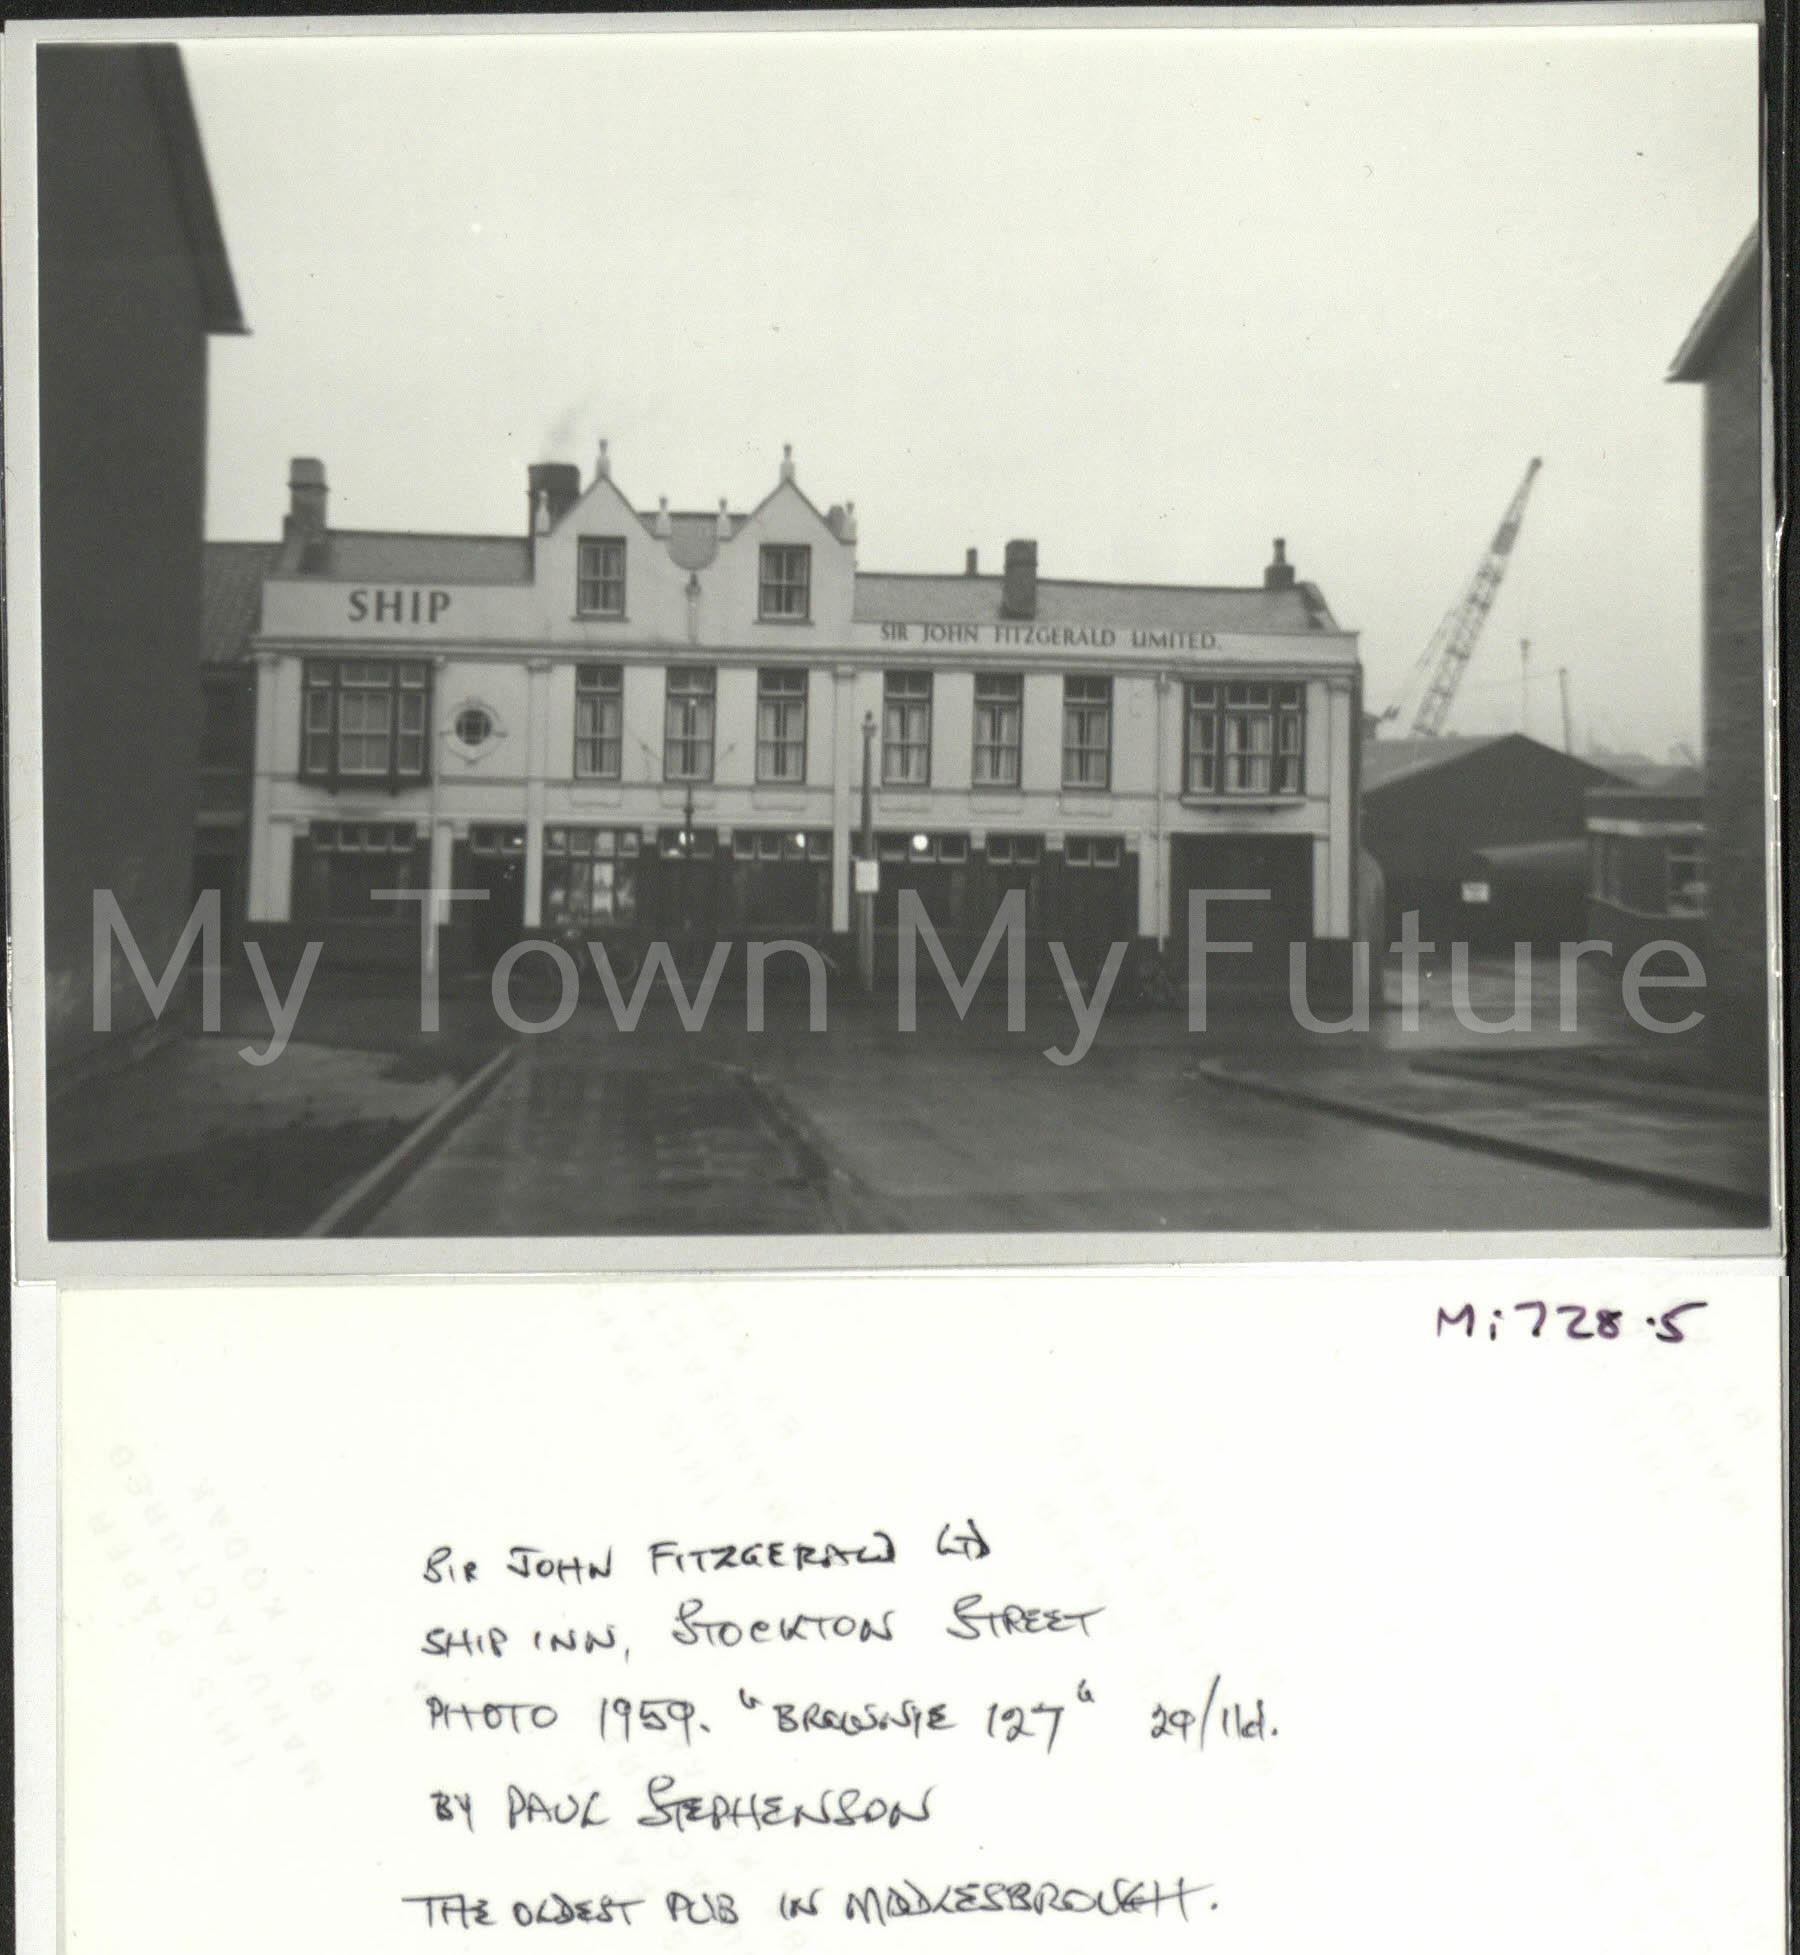 The Ship Inn - Stockton Street - St Hilda's, 1959, Paul Stephenson